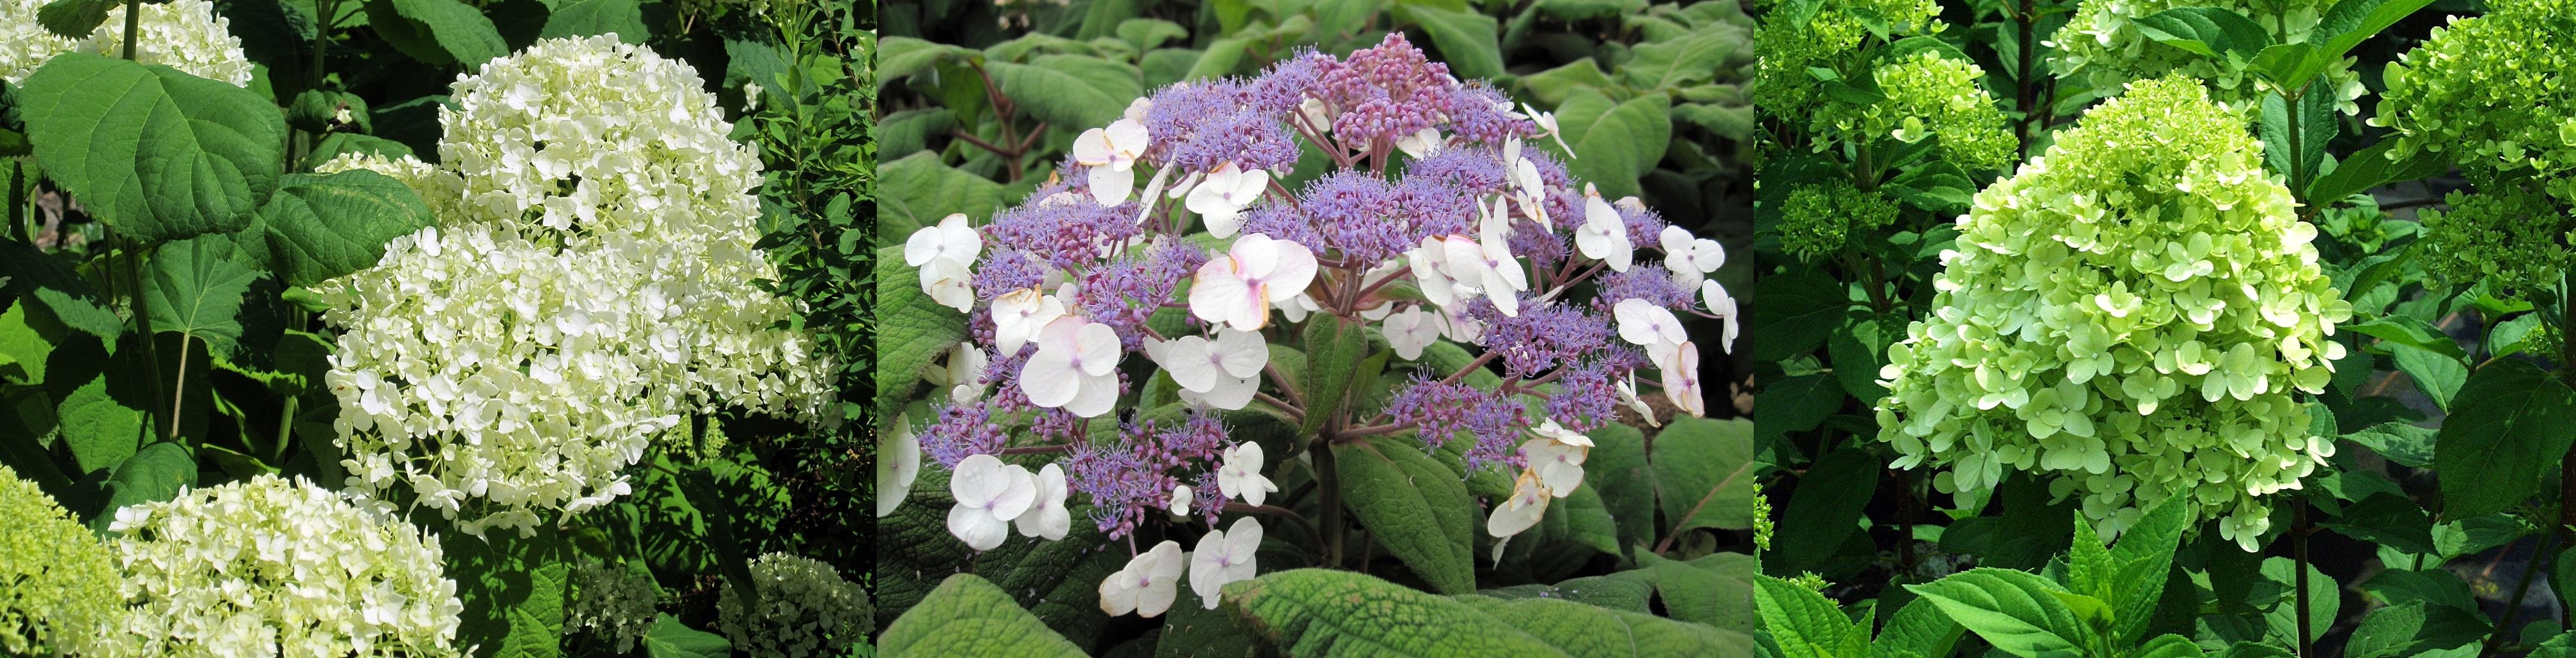 Hydrangea arborescens Annabelle, Hydrangea aspera Macrophylla, Hydrangea paniculata Limelight